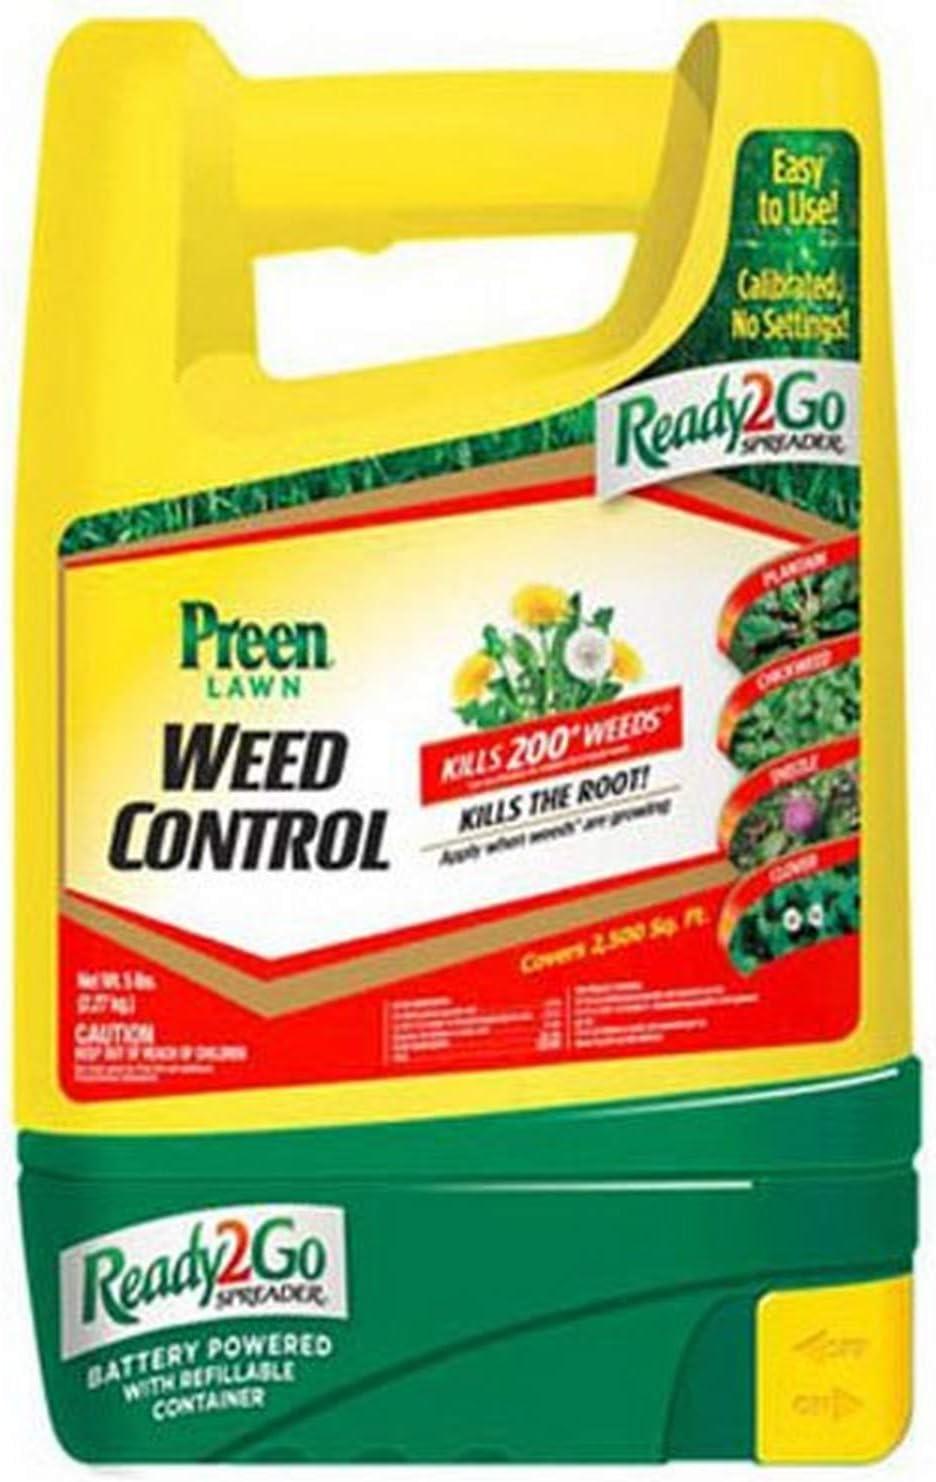 Preen Lawn Weed Control Ready 2 Go Spreader, 5 lb - 100517184